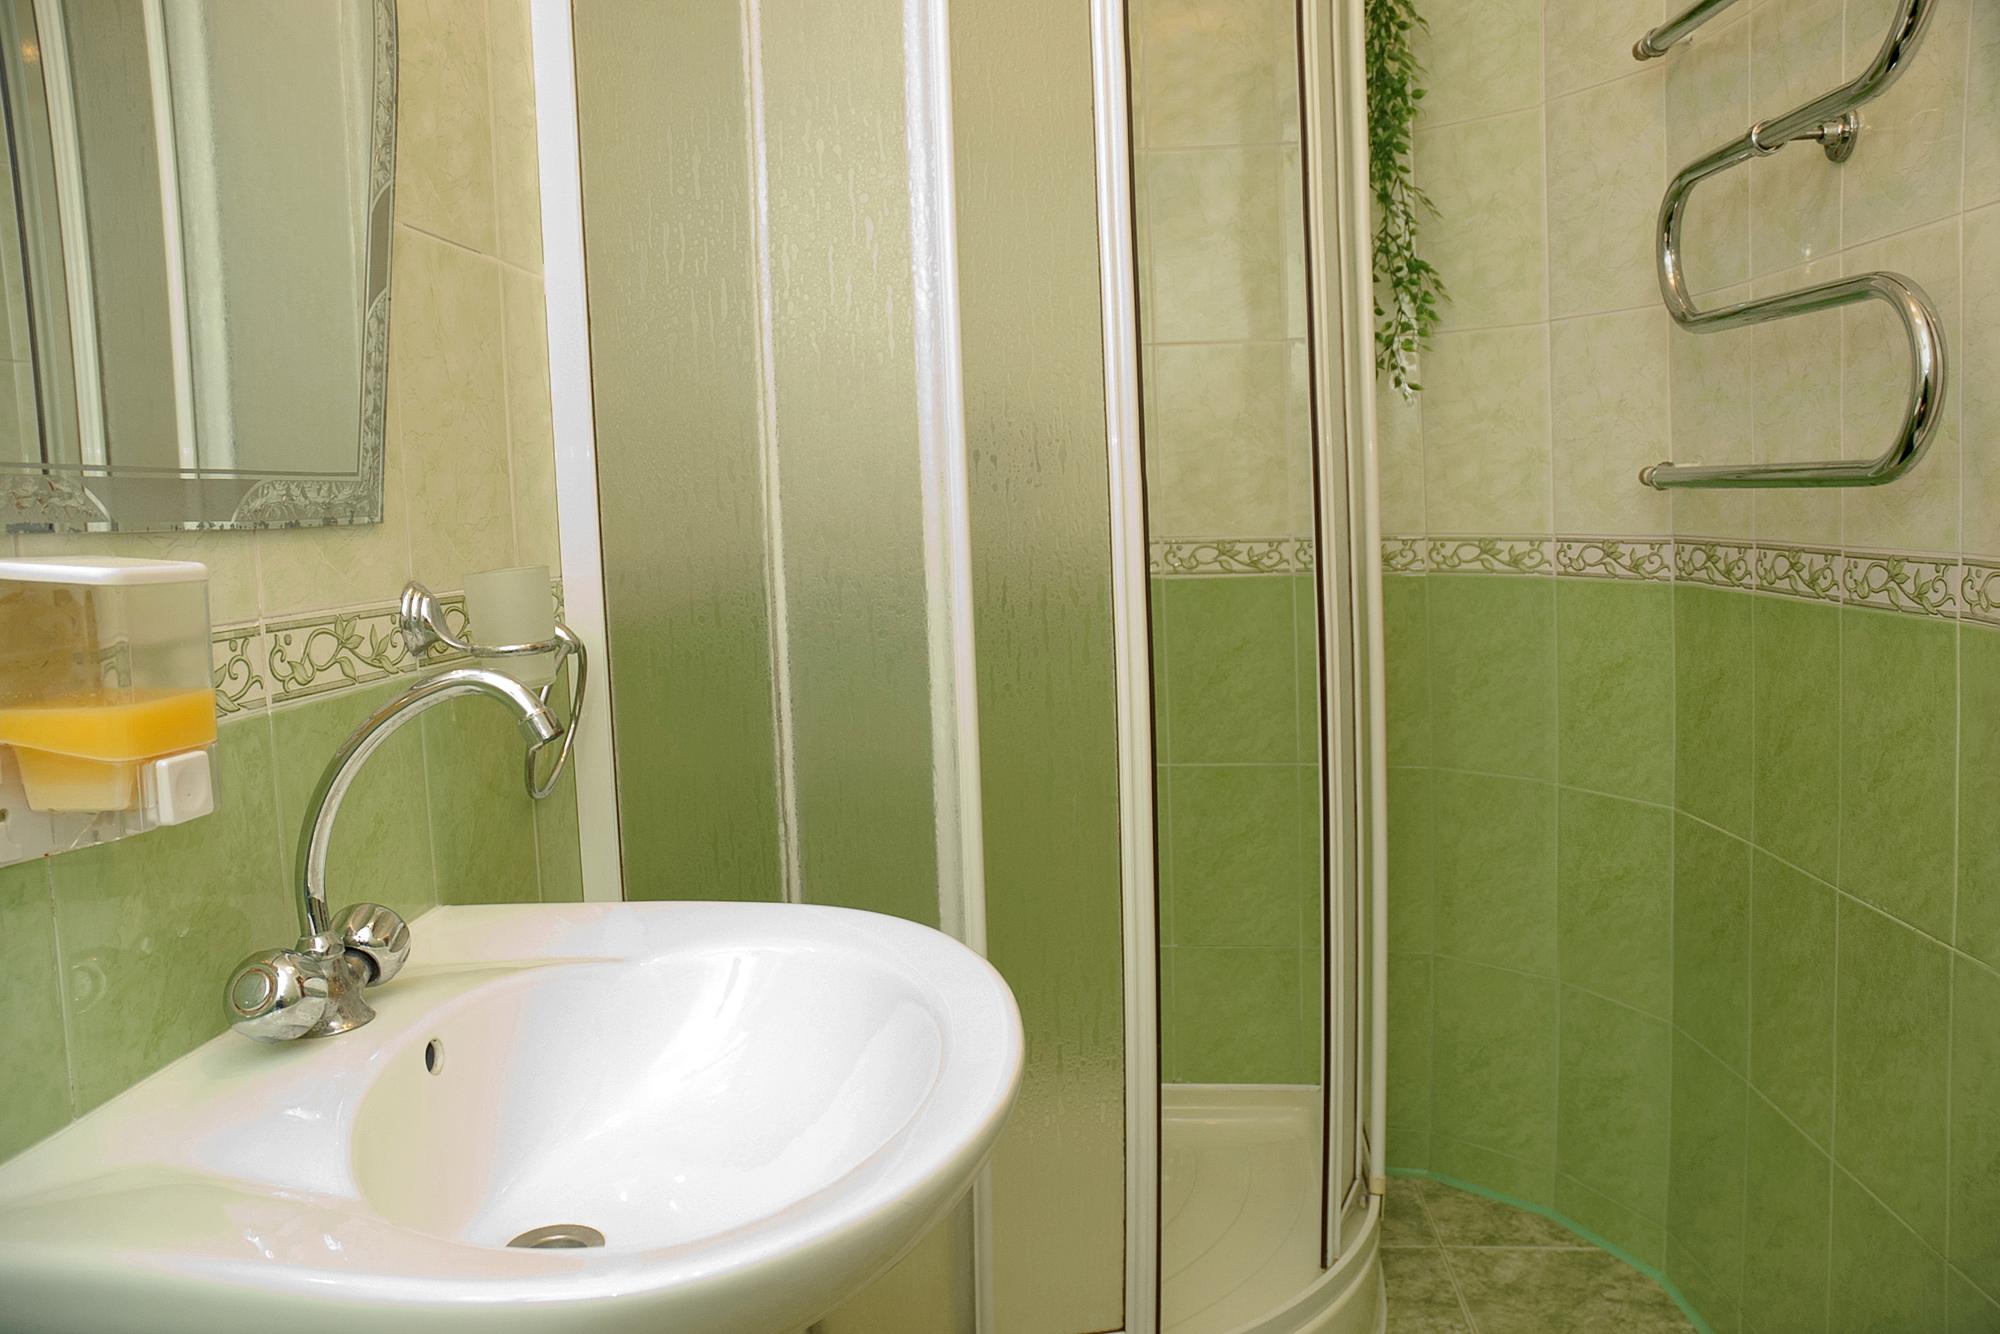 Ванная комната дизайн эконом класса